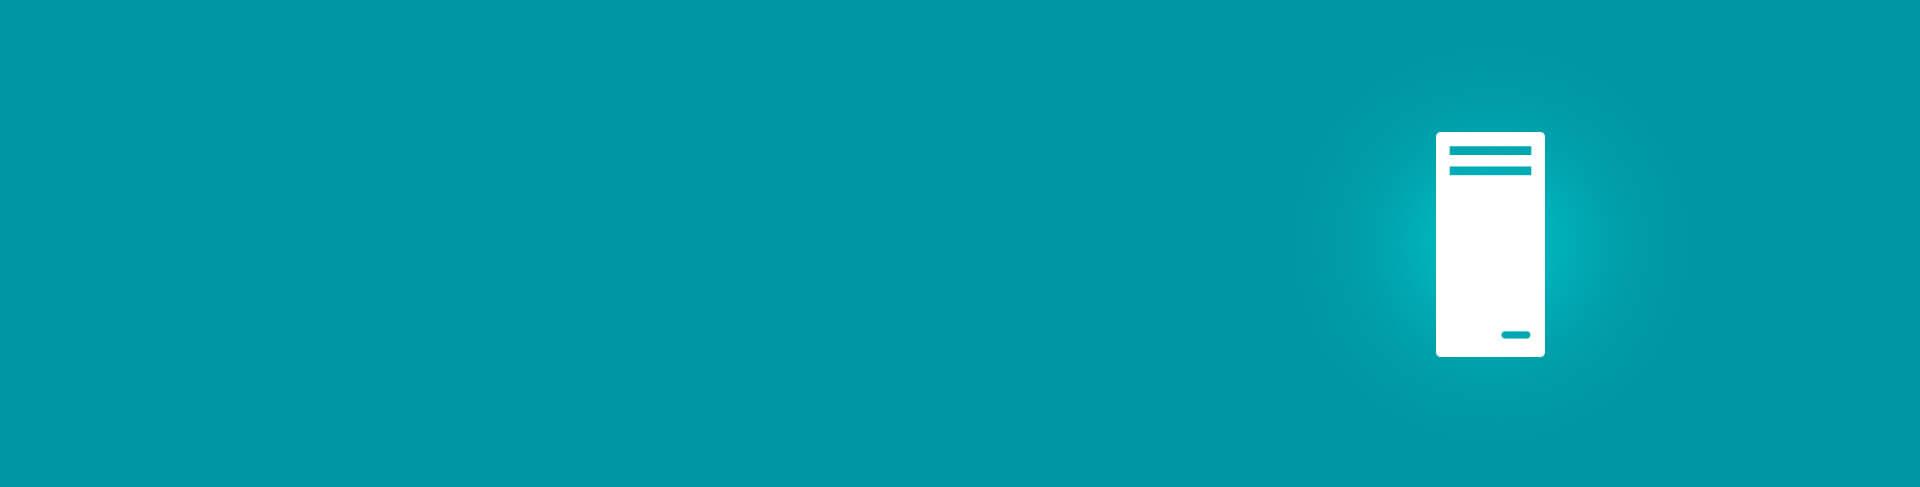 ESET Server security banner